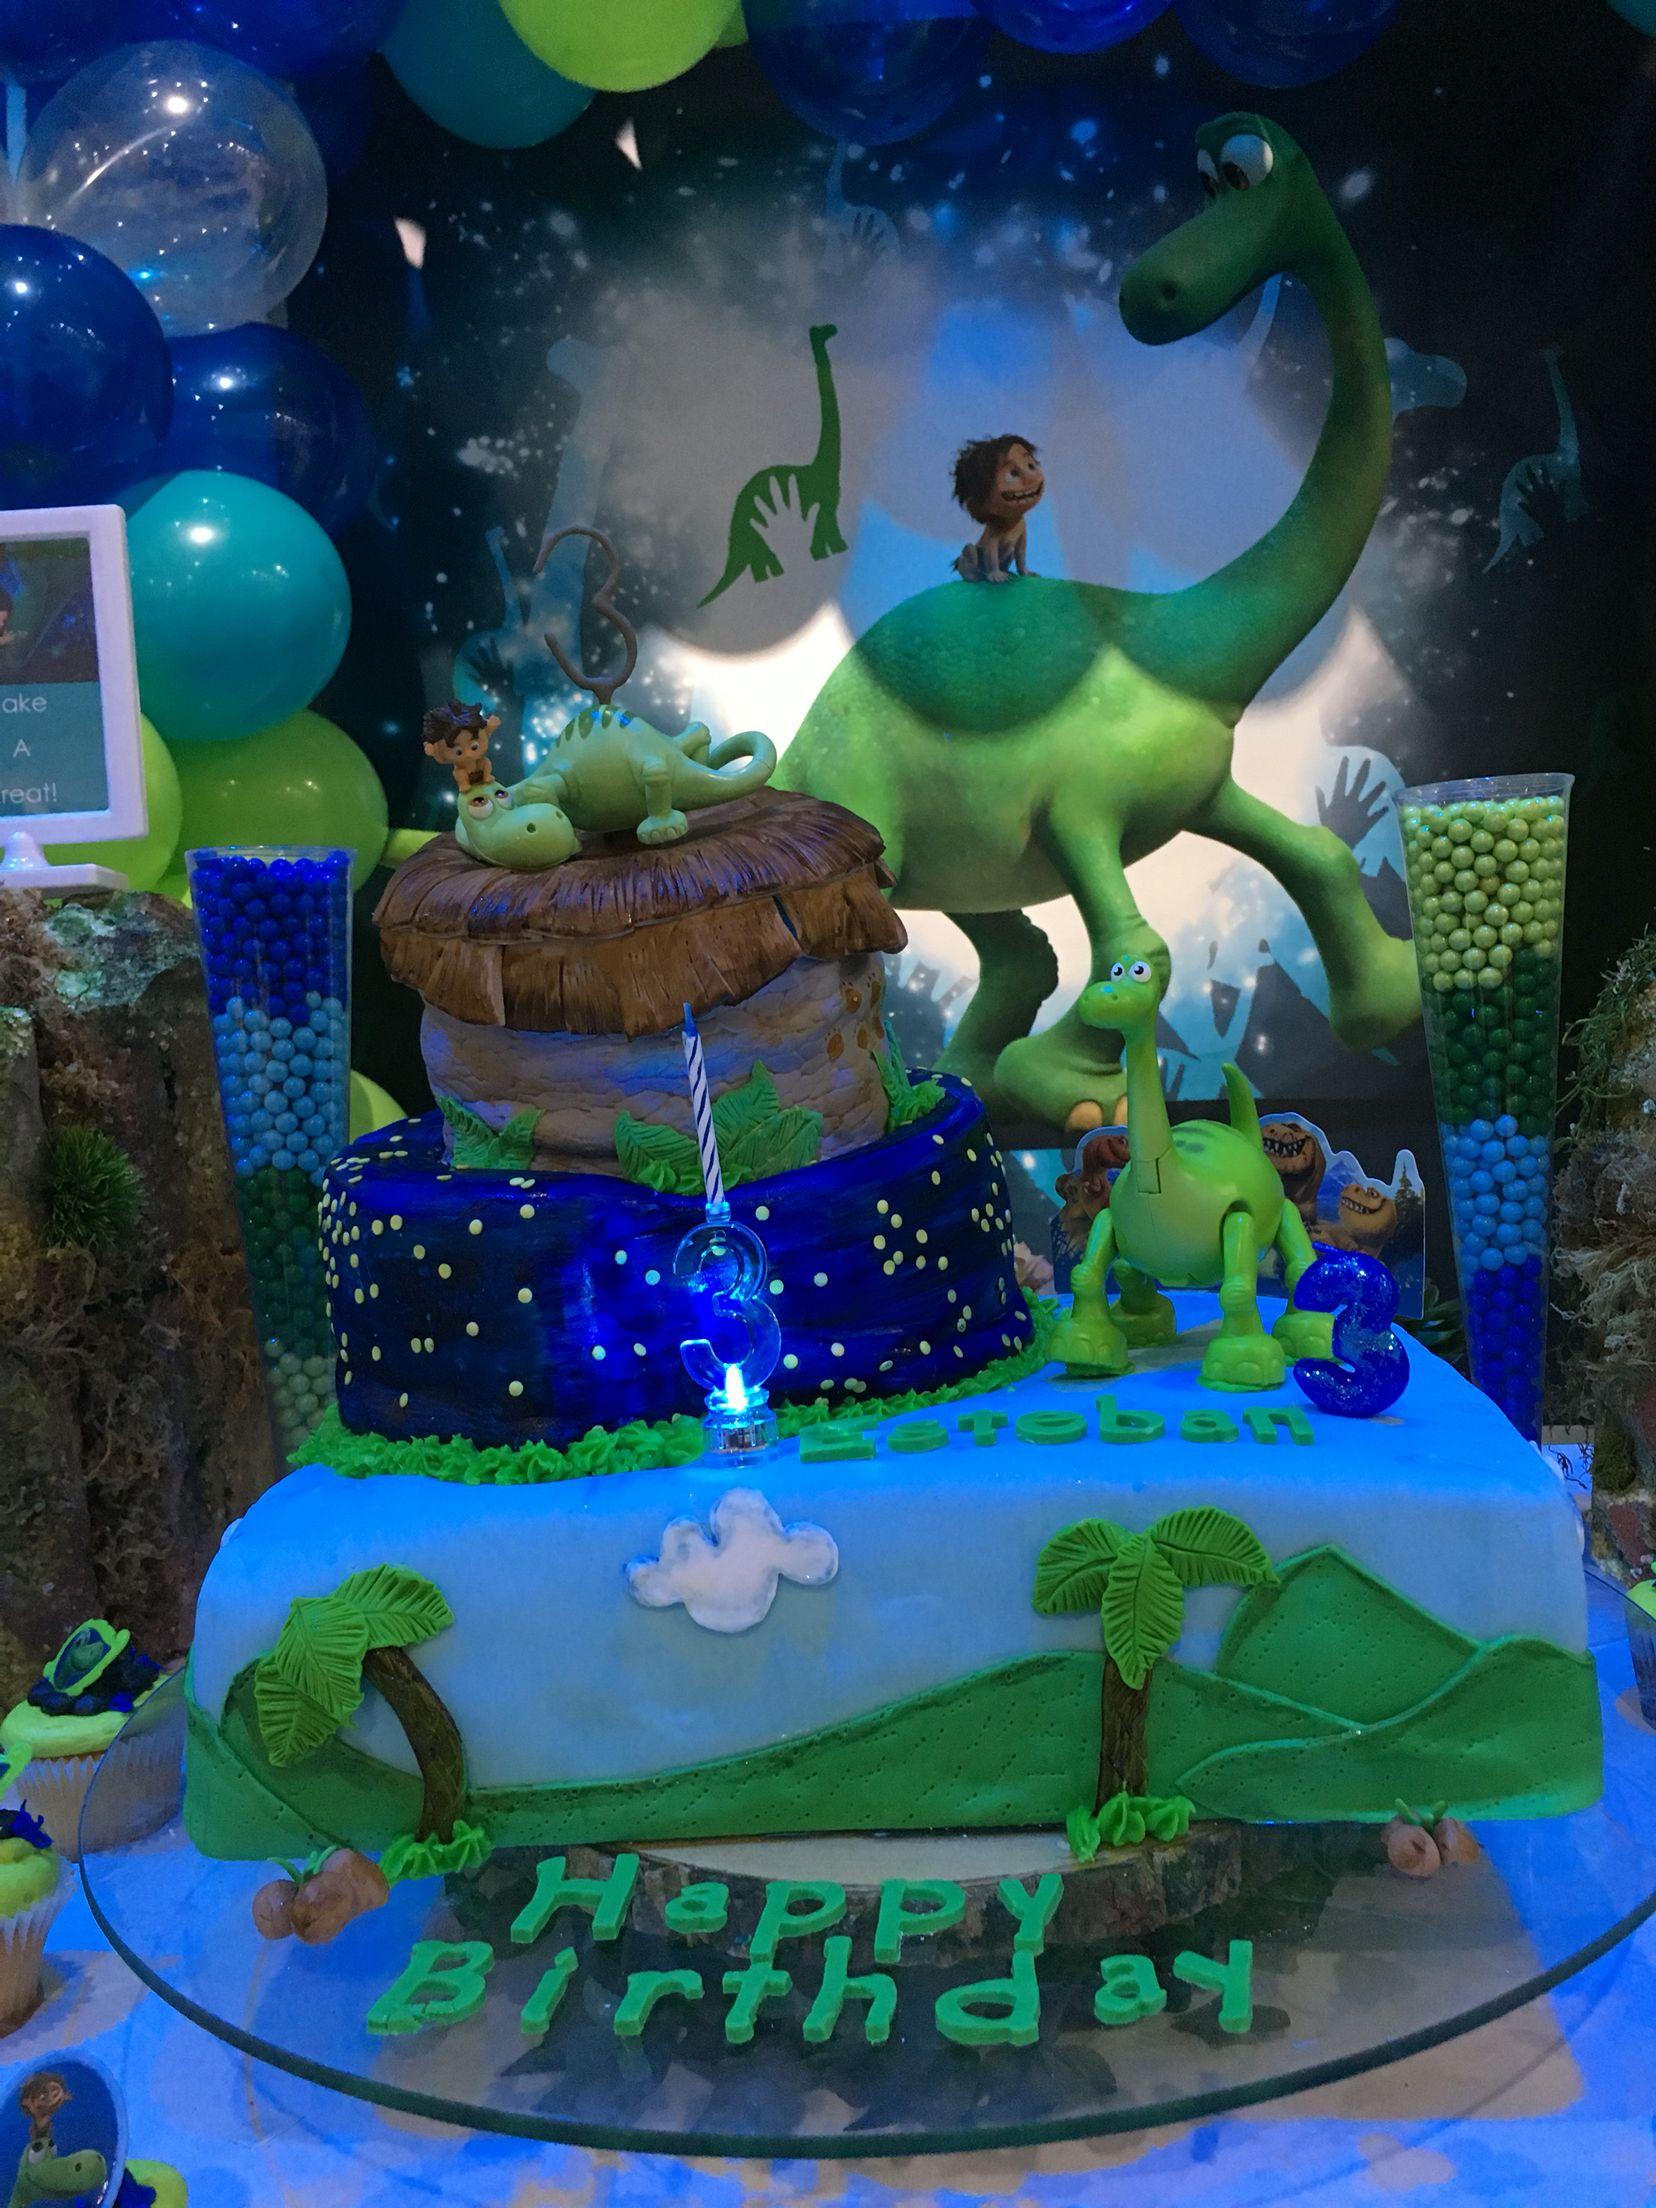 The good dinosaur cake Party ideas Pinterest Dinosaur cake and